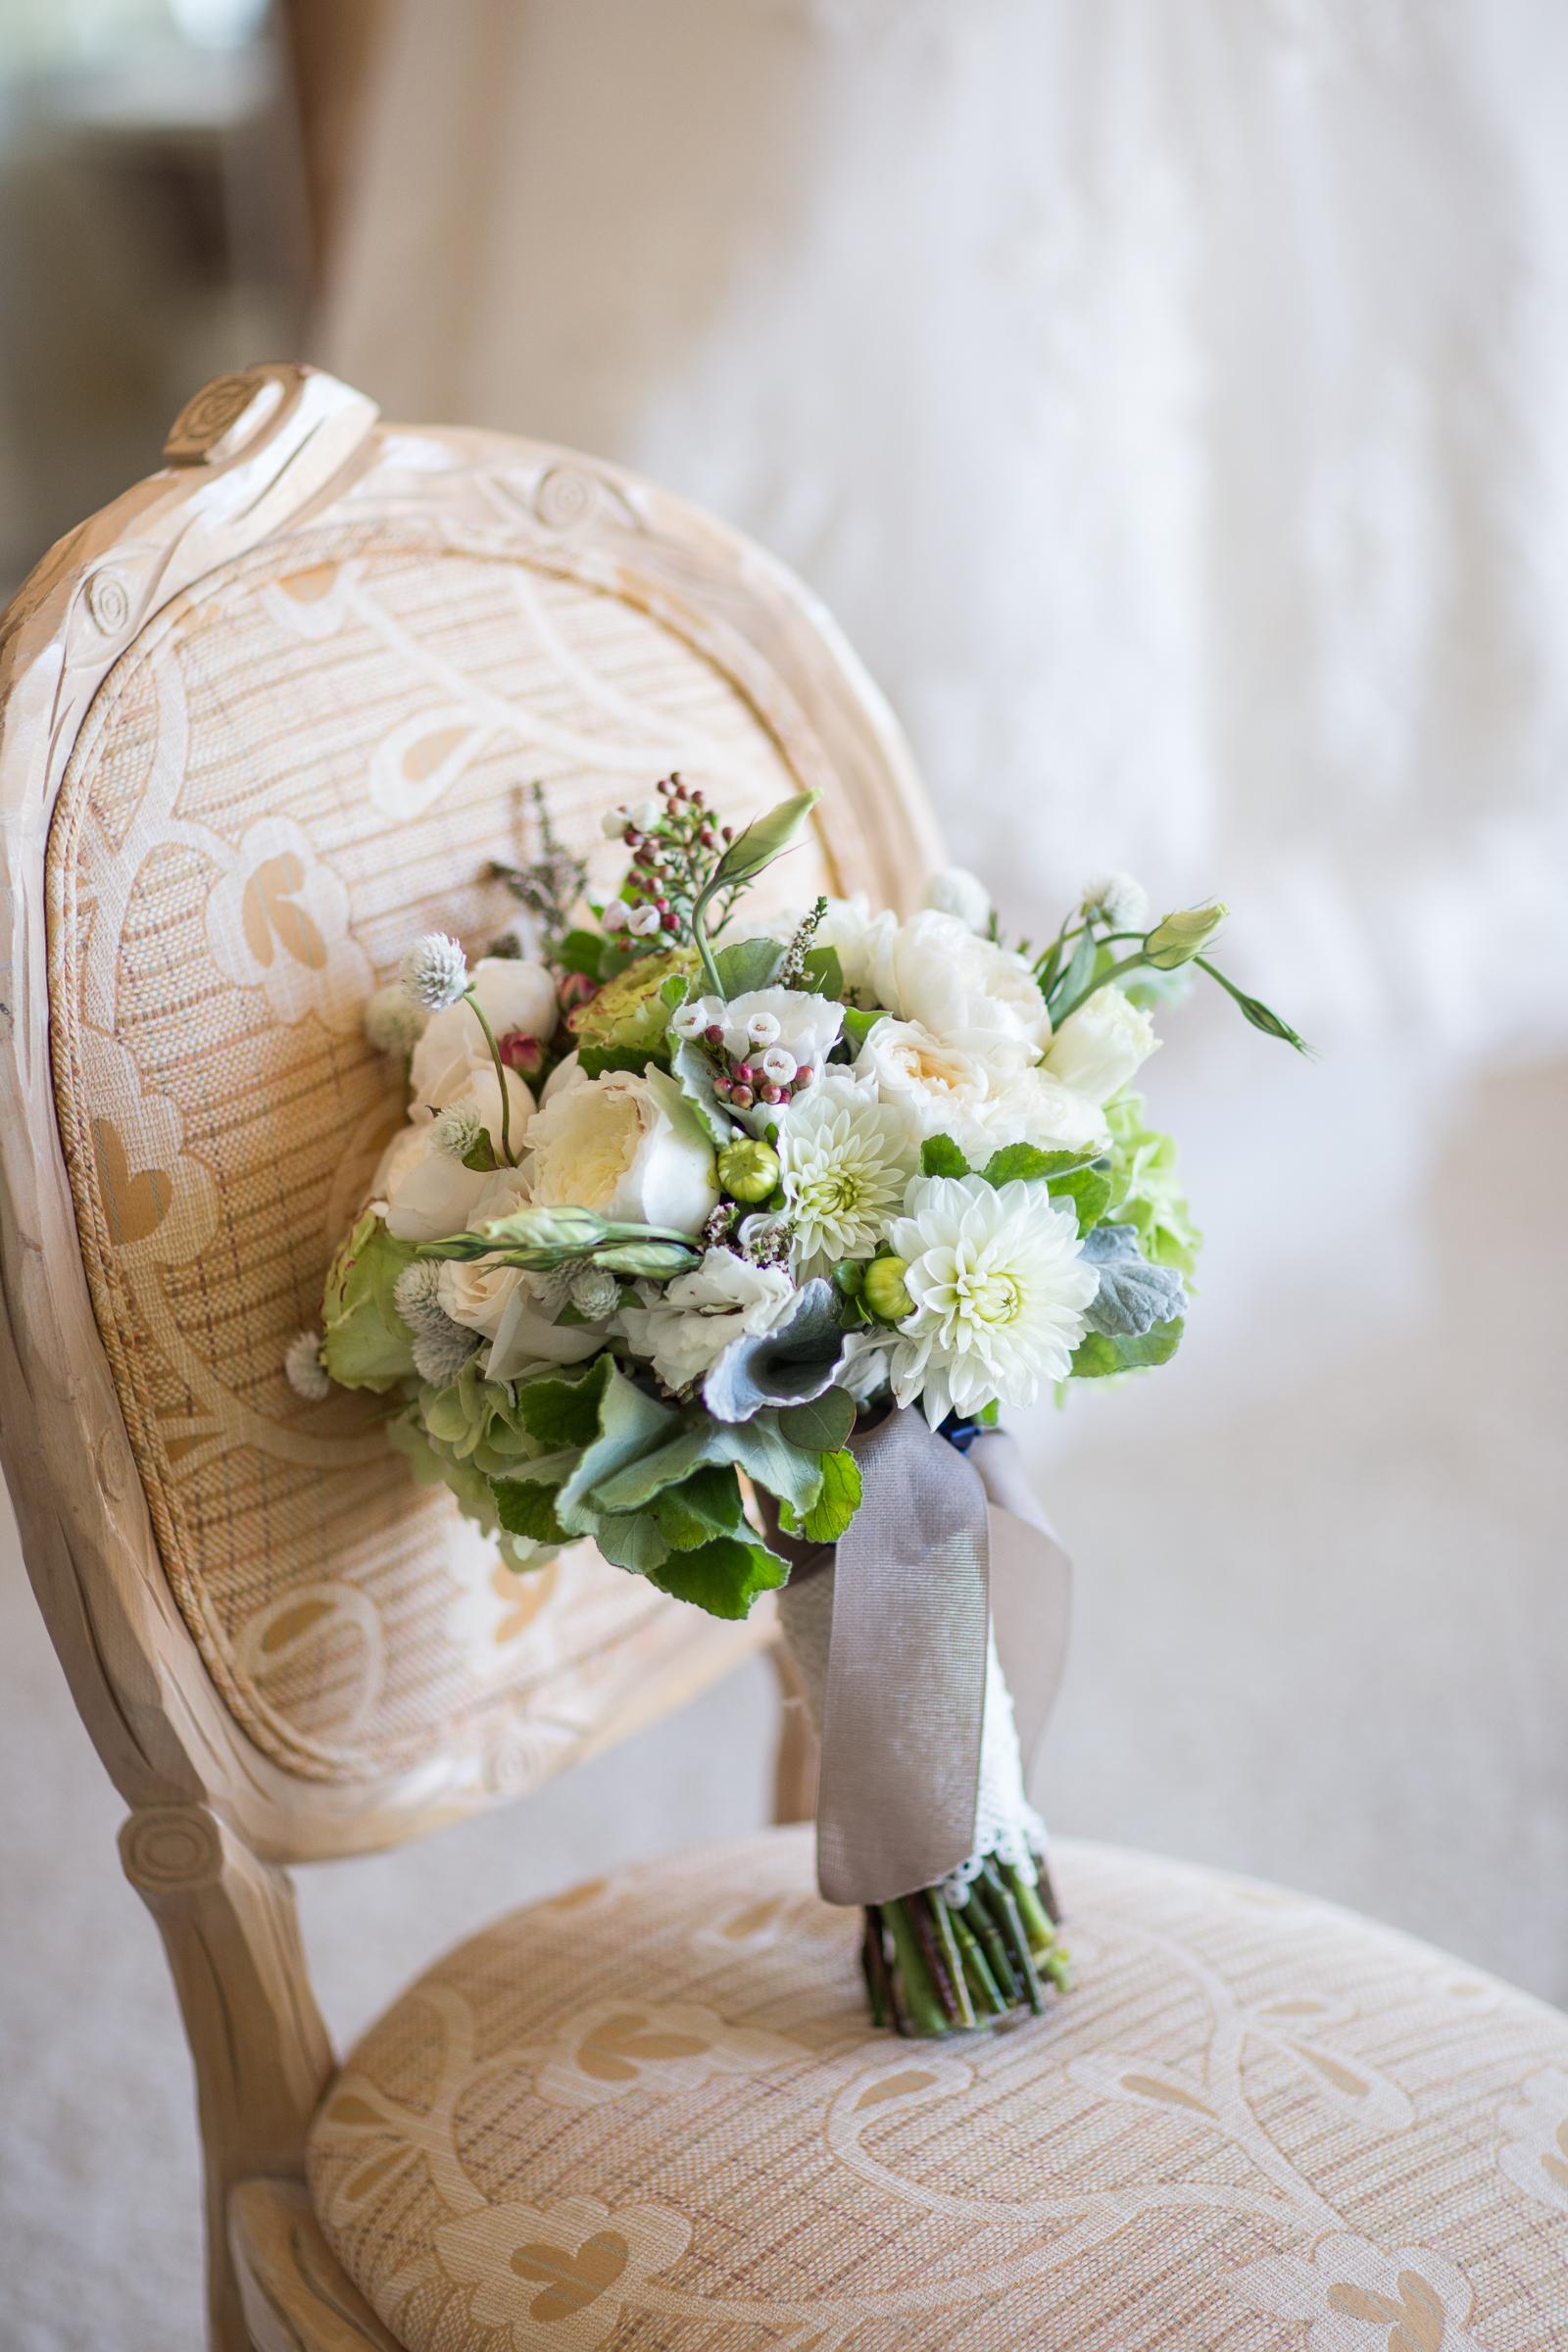 magnoliaeventdesign.com |  A Four Seasons Santa Barbara at La Pacifica Wedding Photographed by Melissa Musgrove  | Magnolia Event Design in Santa Barbara